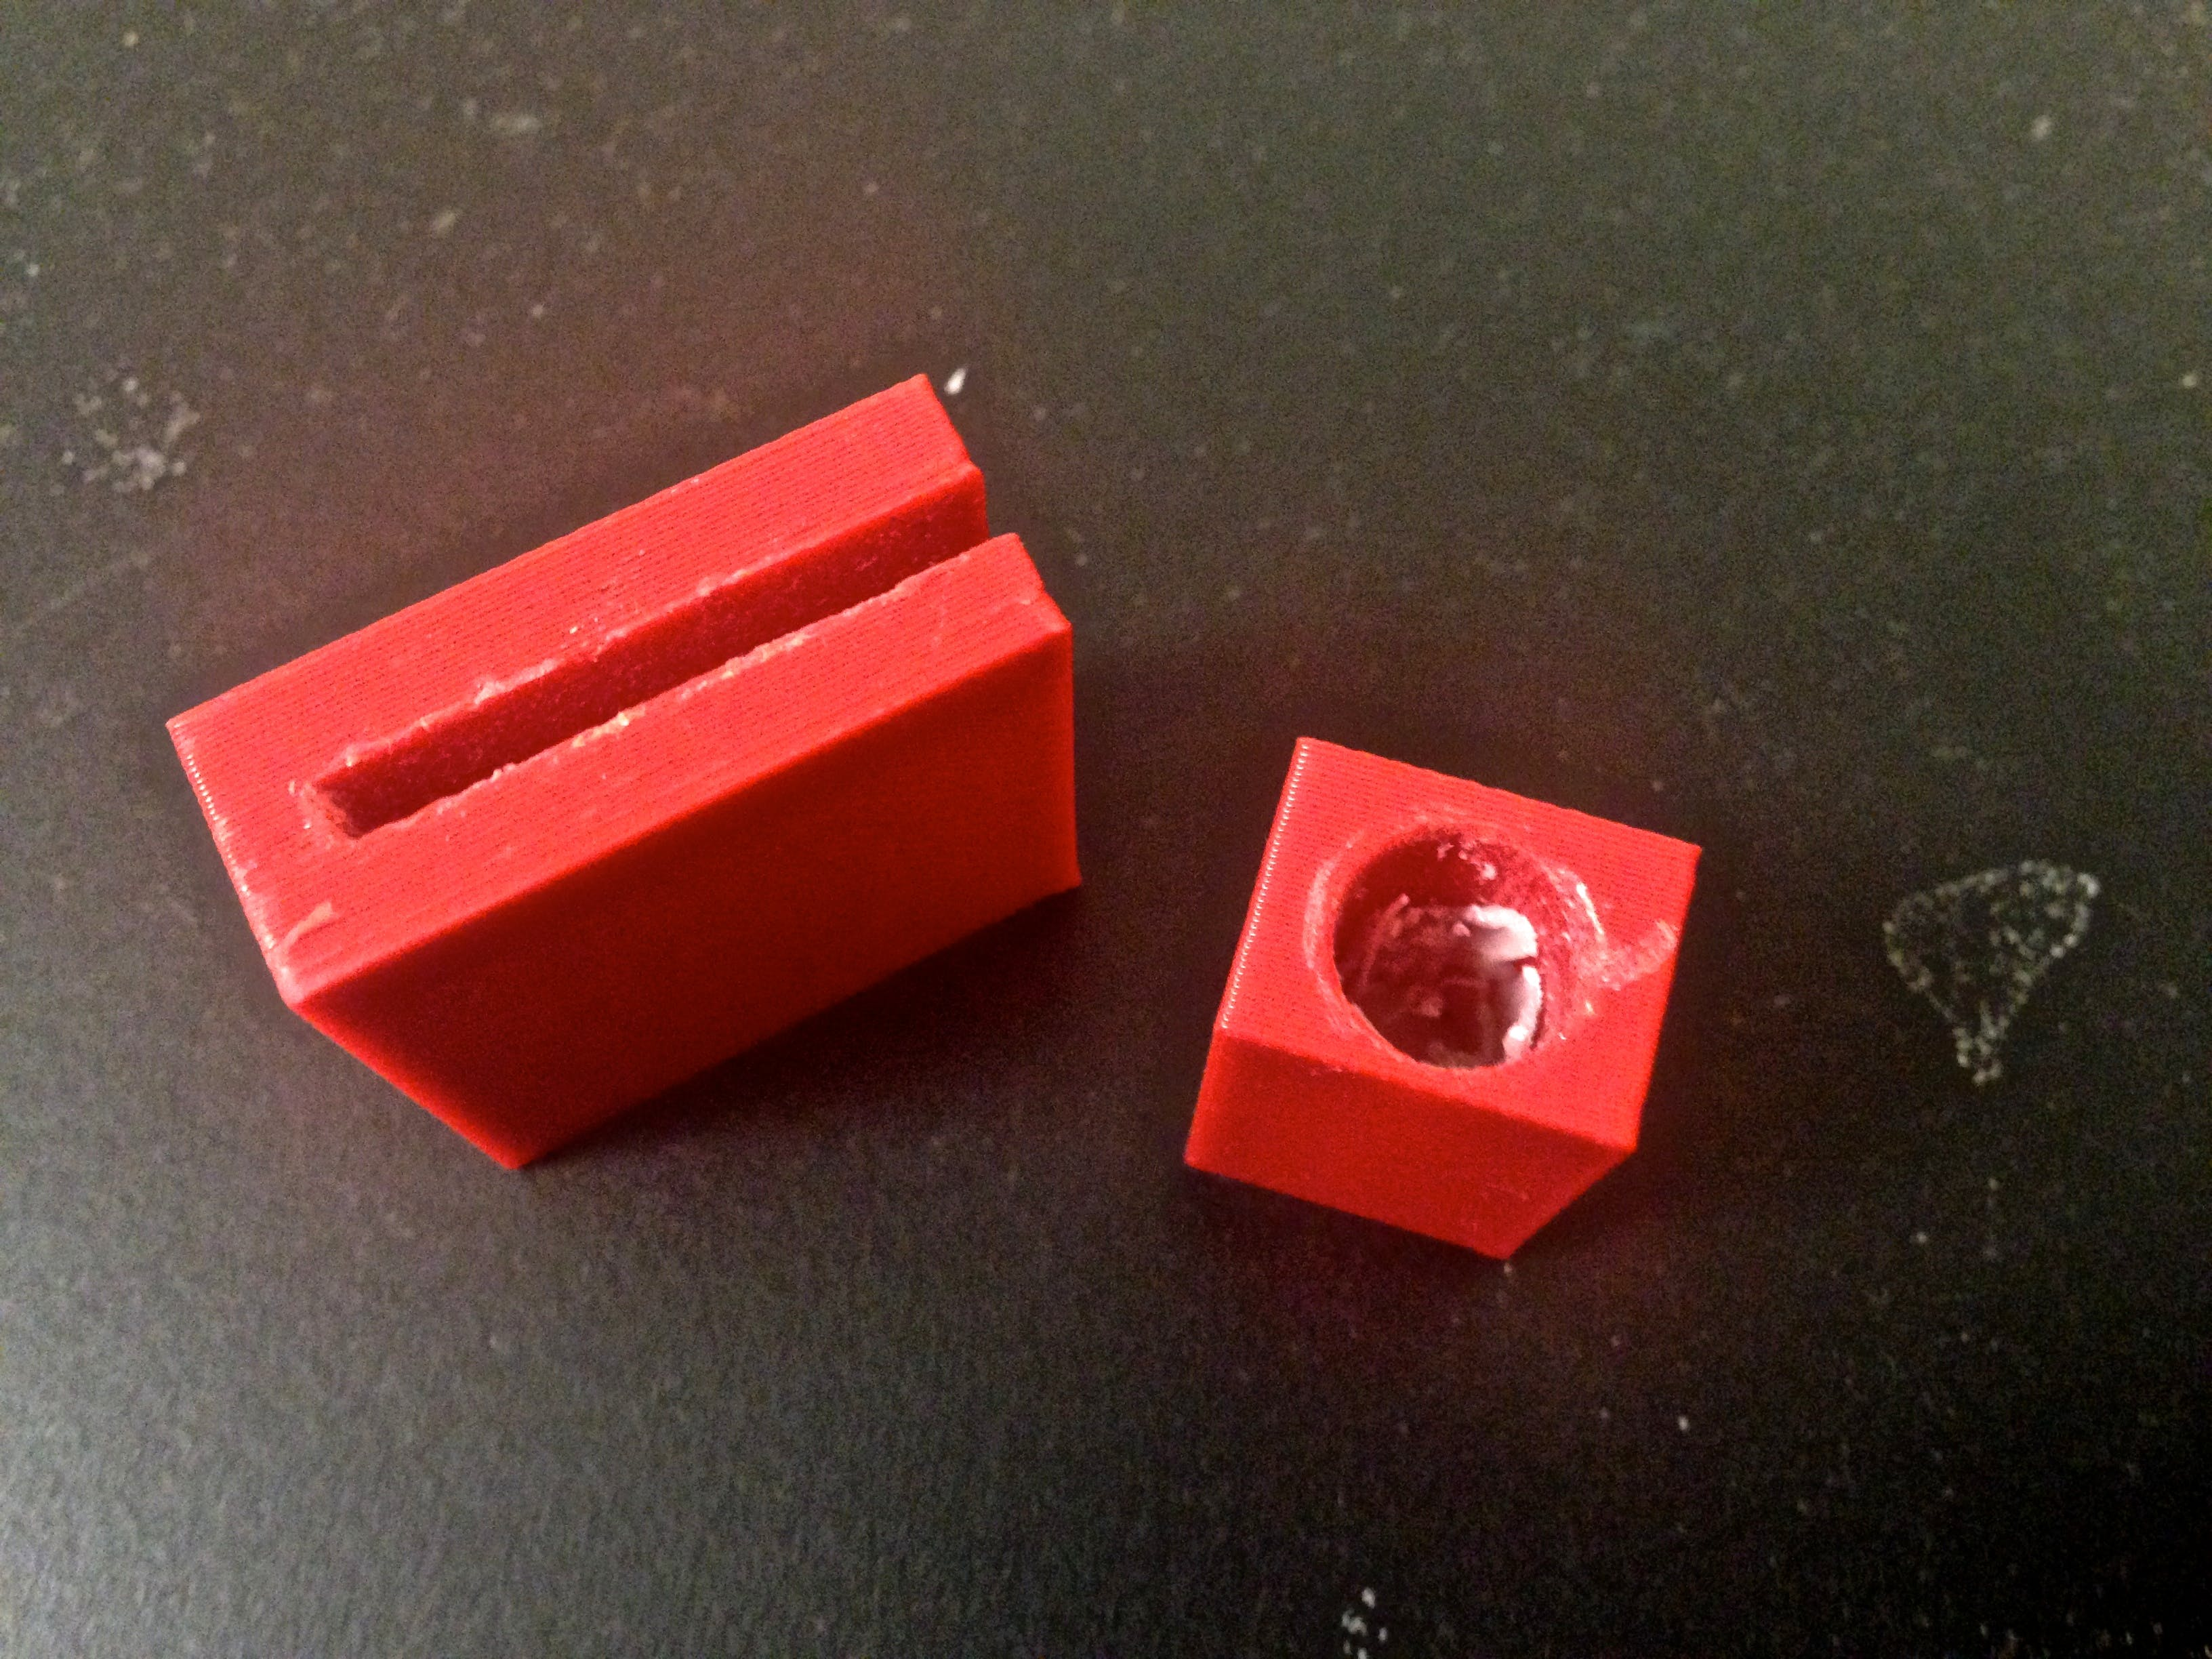 Notch for locking mechanism prototypes